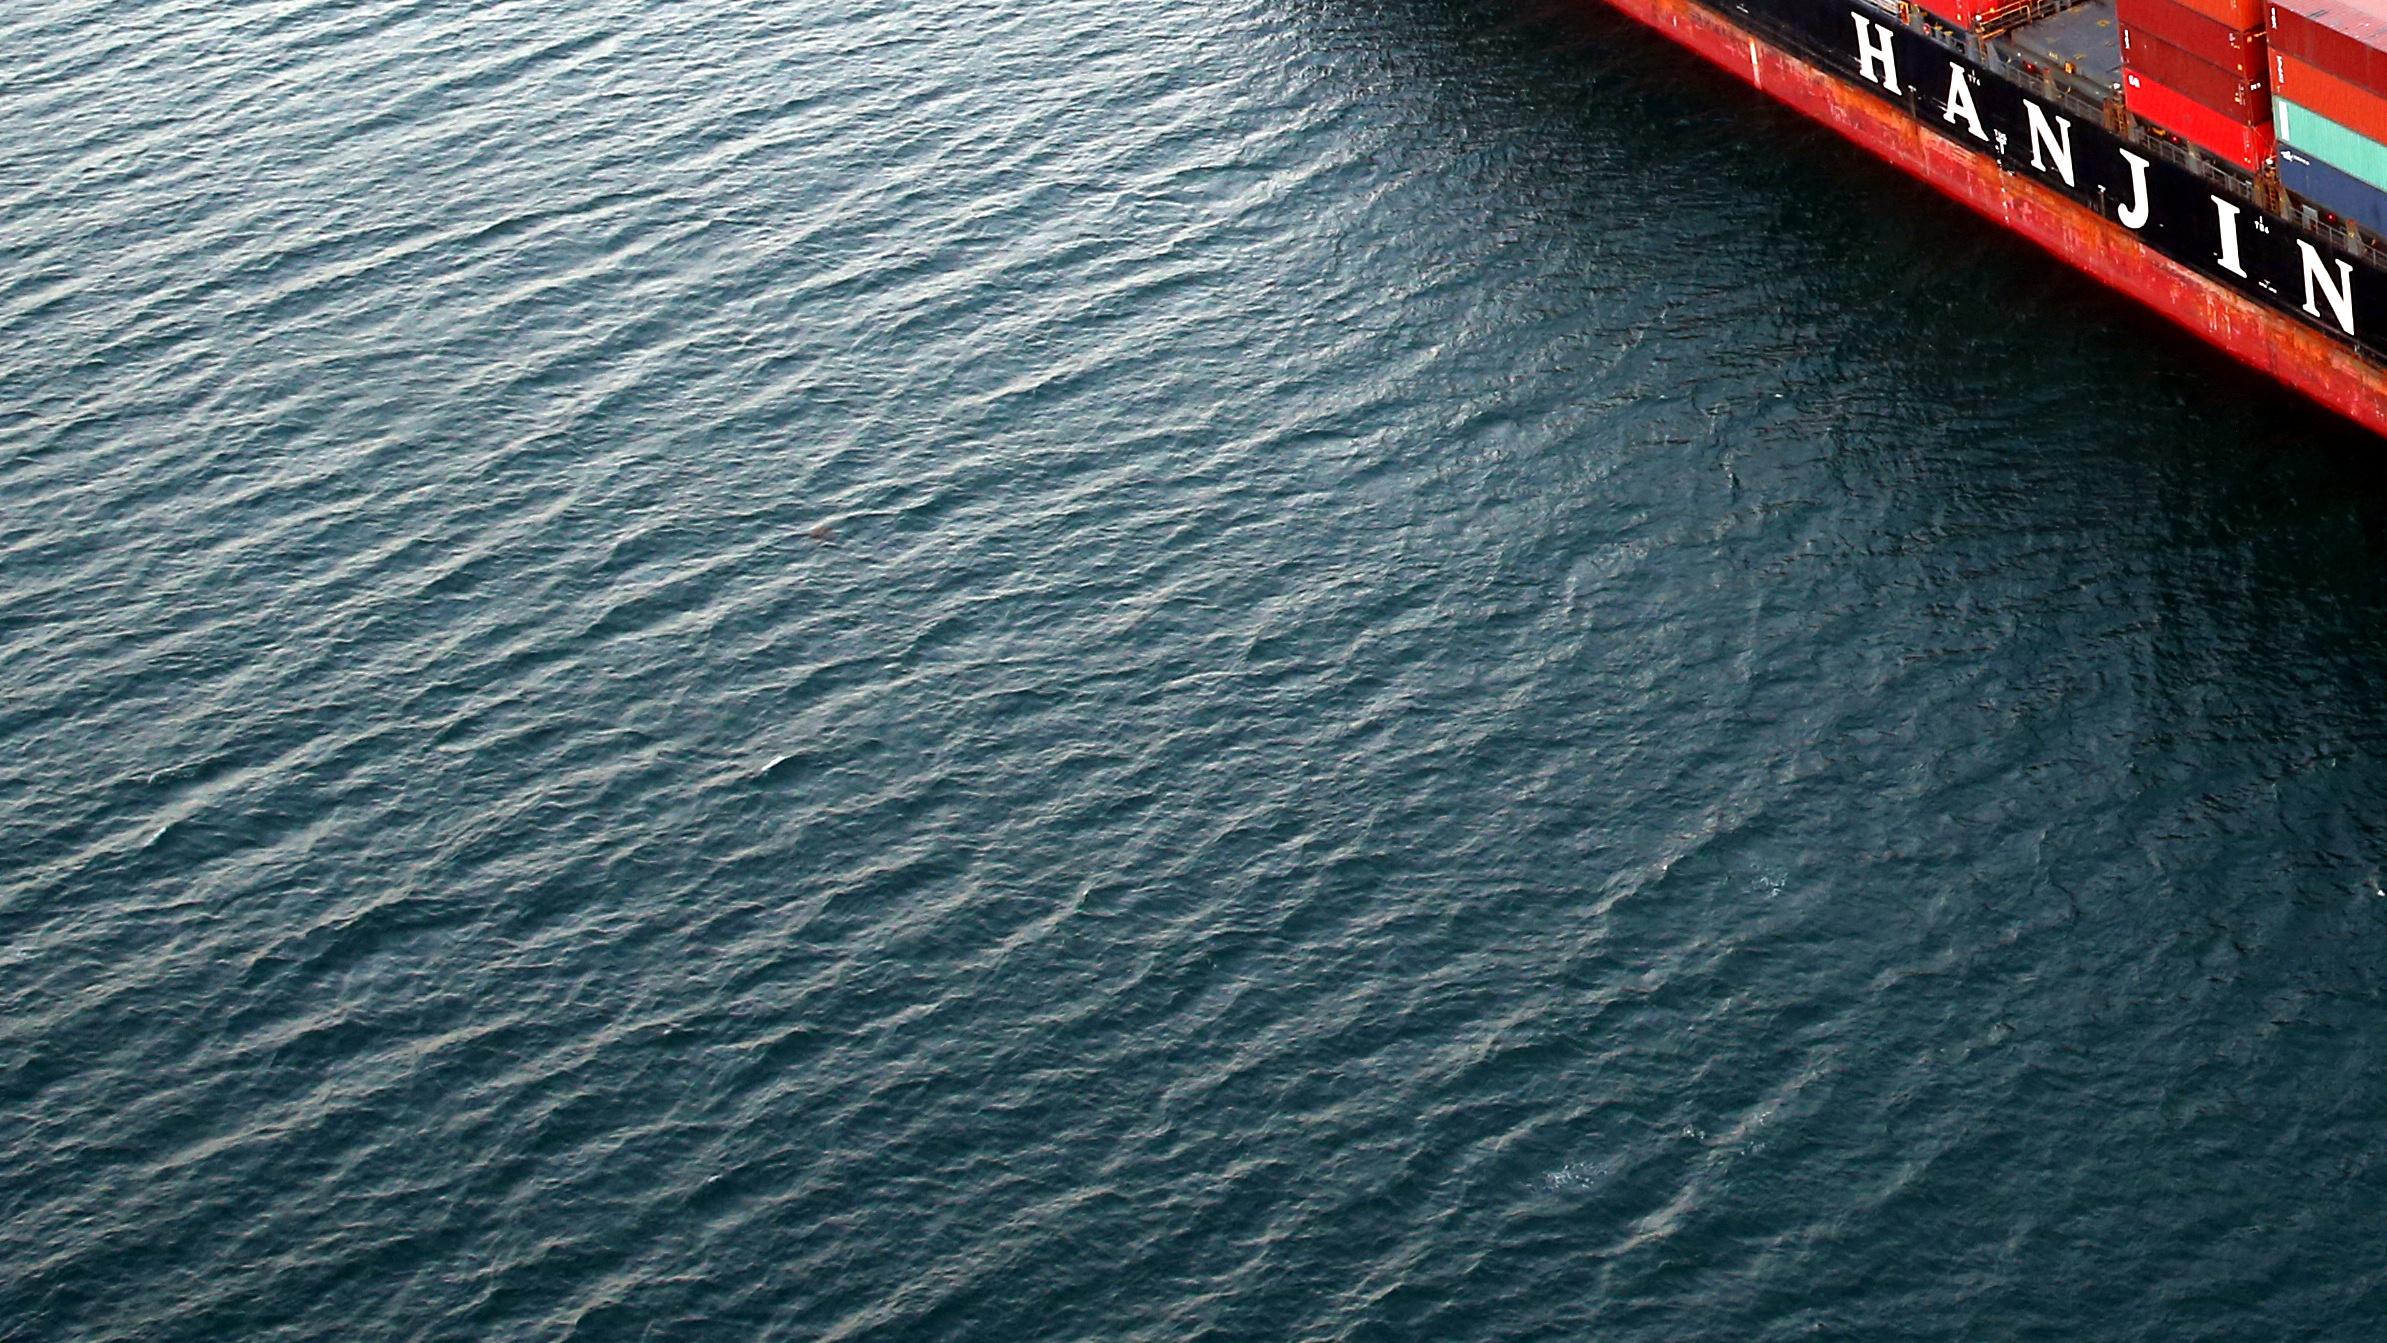 A Hanjin Shipping Co ship is seen stranded outside the Port of Long Beach, California, U.S., September 8, 2016.